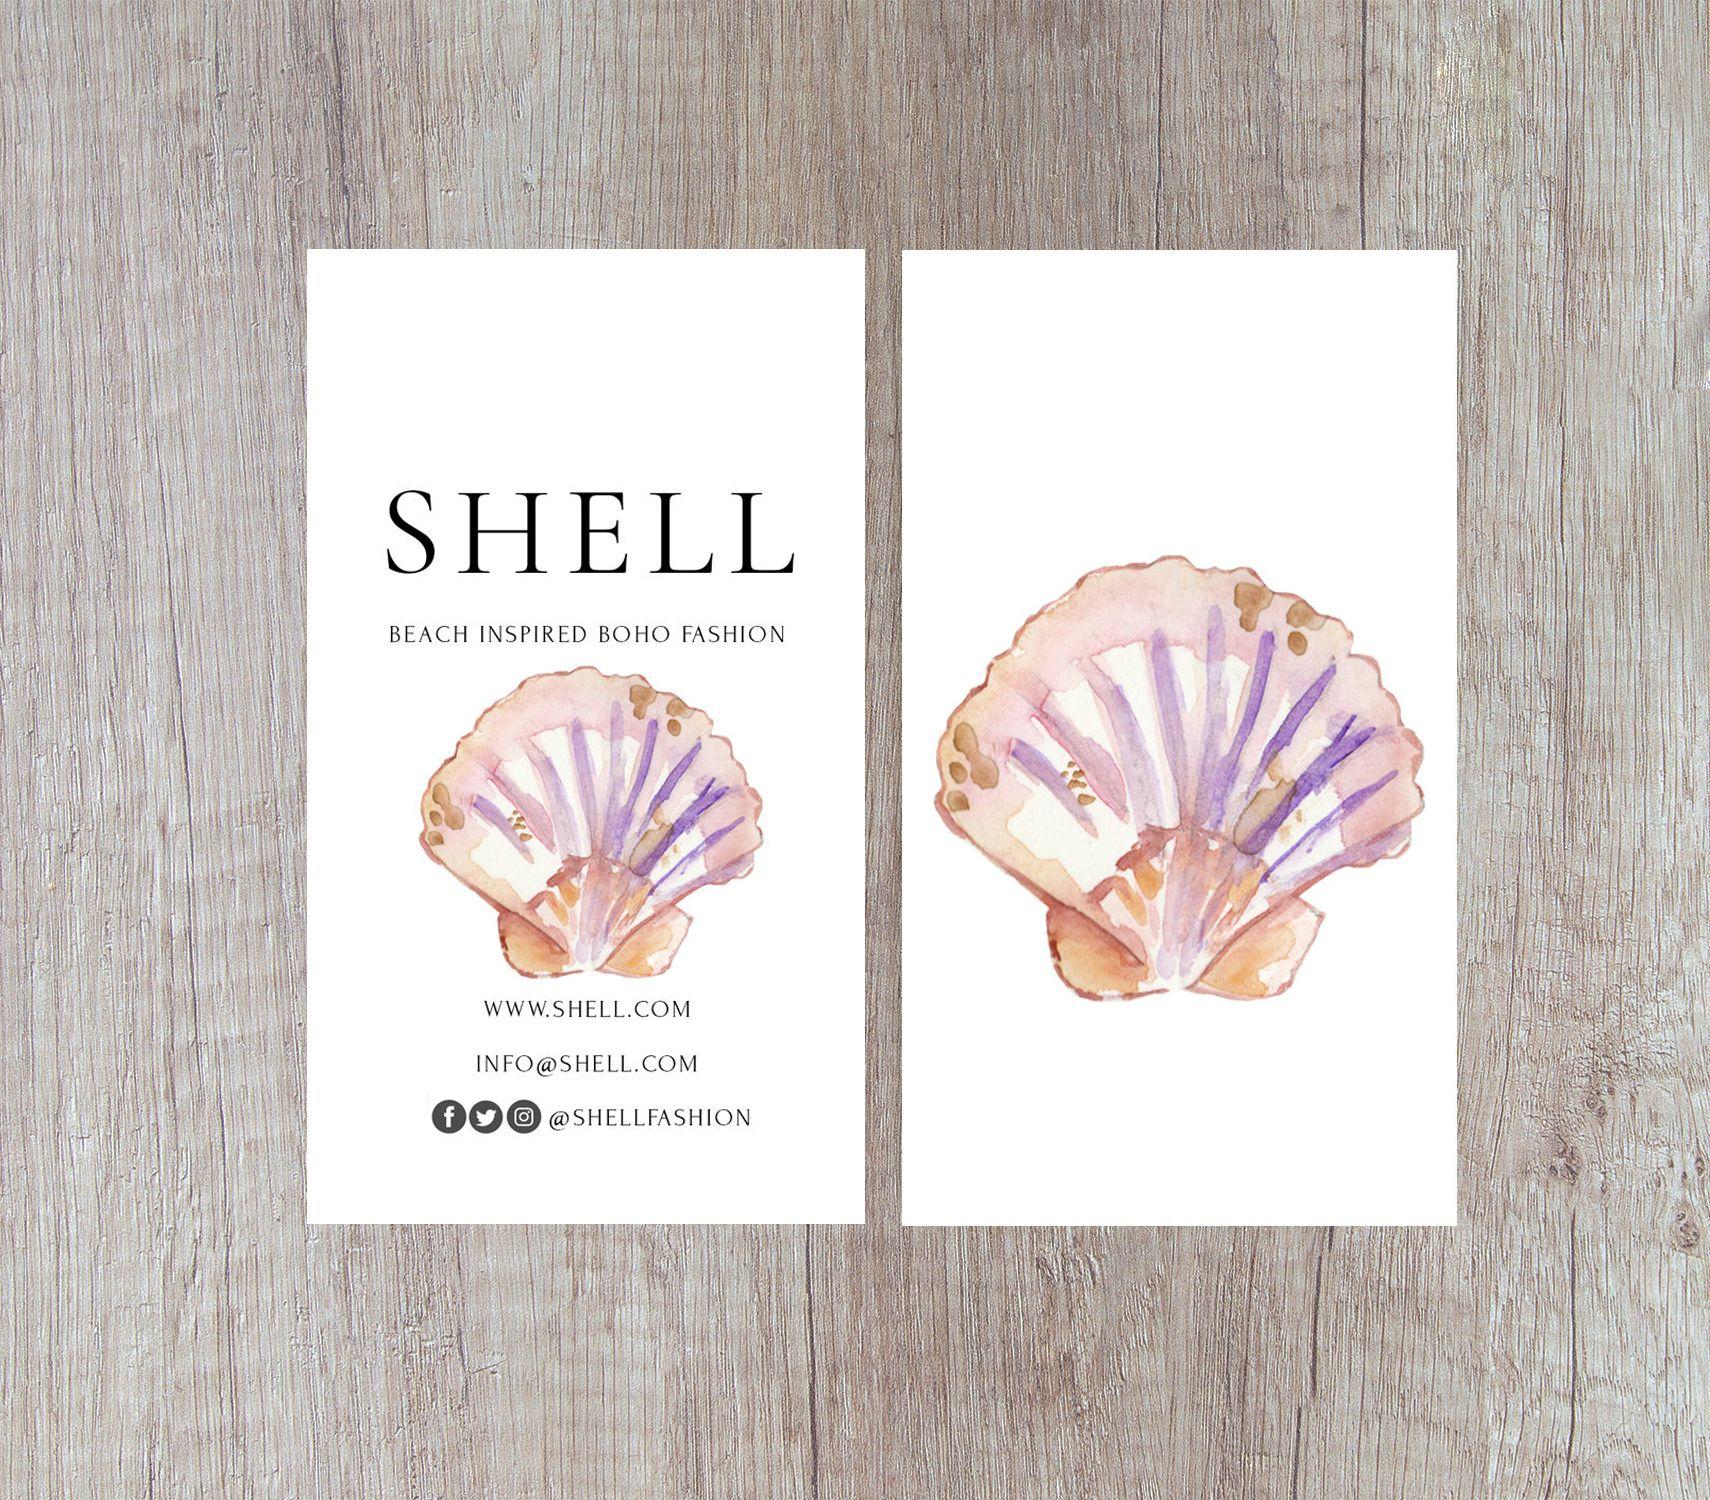 Shell business card shell design sea business card beach business shell business card shell design sea business card beach business card ocean business card business card template card design colourmoves